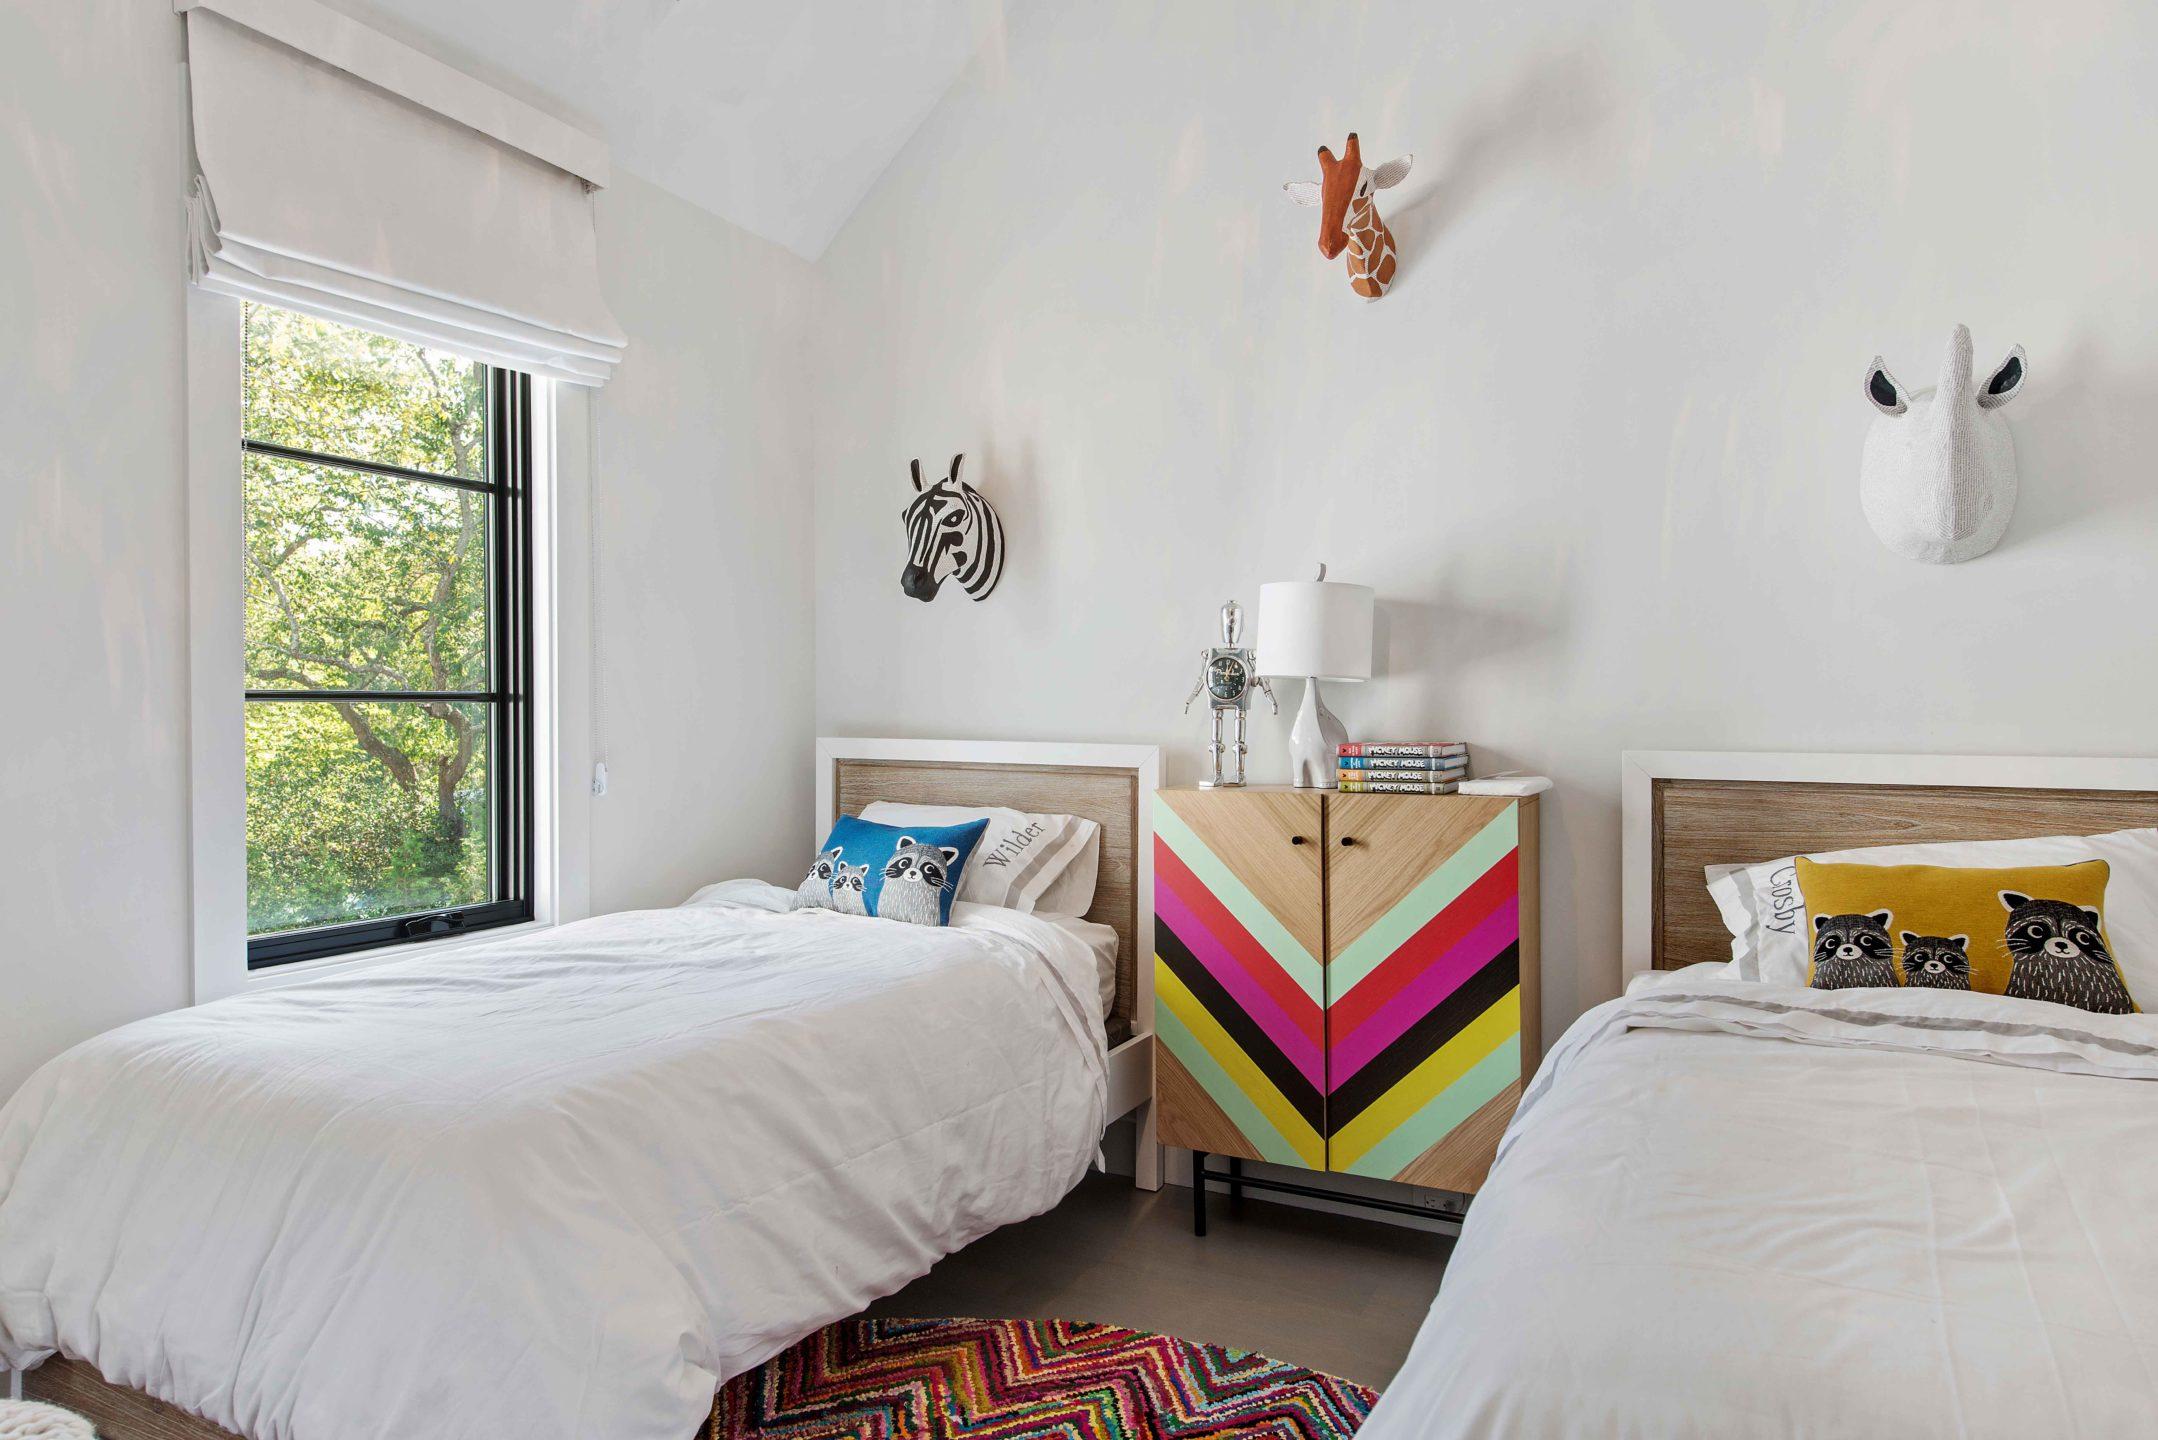 Nicole-Fuller-Interior-Designer-east-hampton-modern-bohemian-beach-house-extra-bedroom